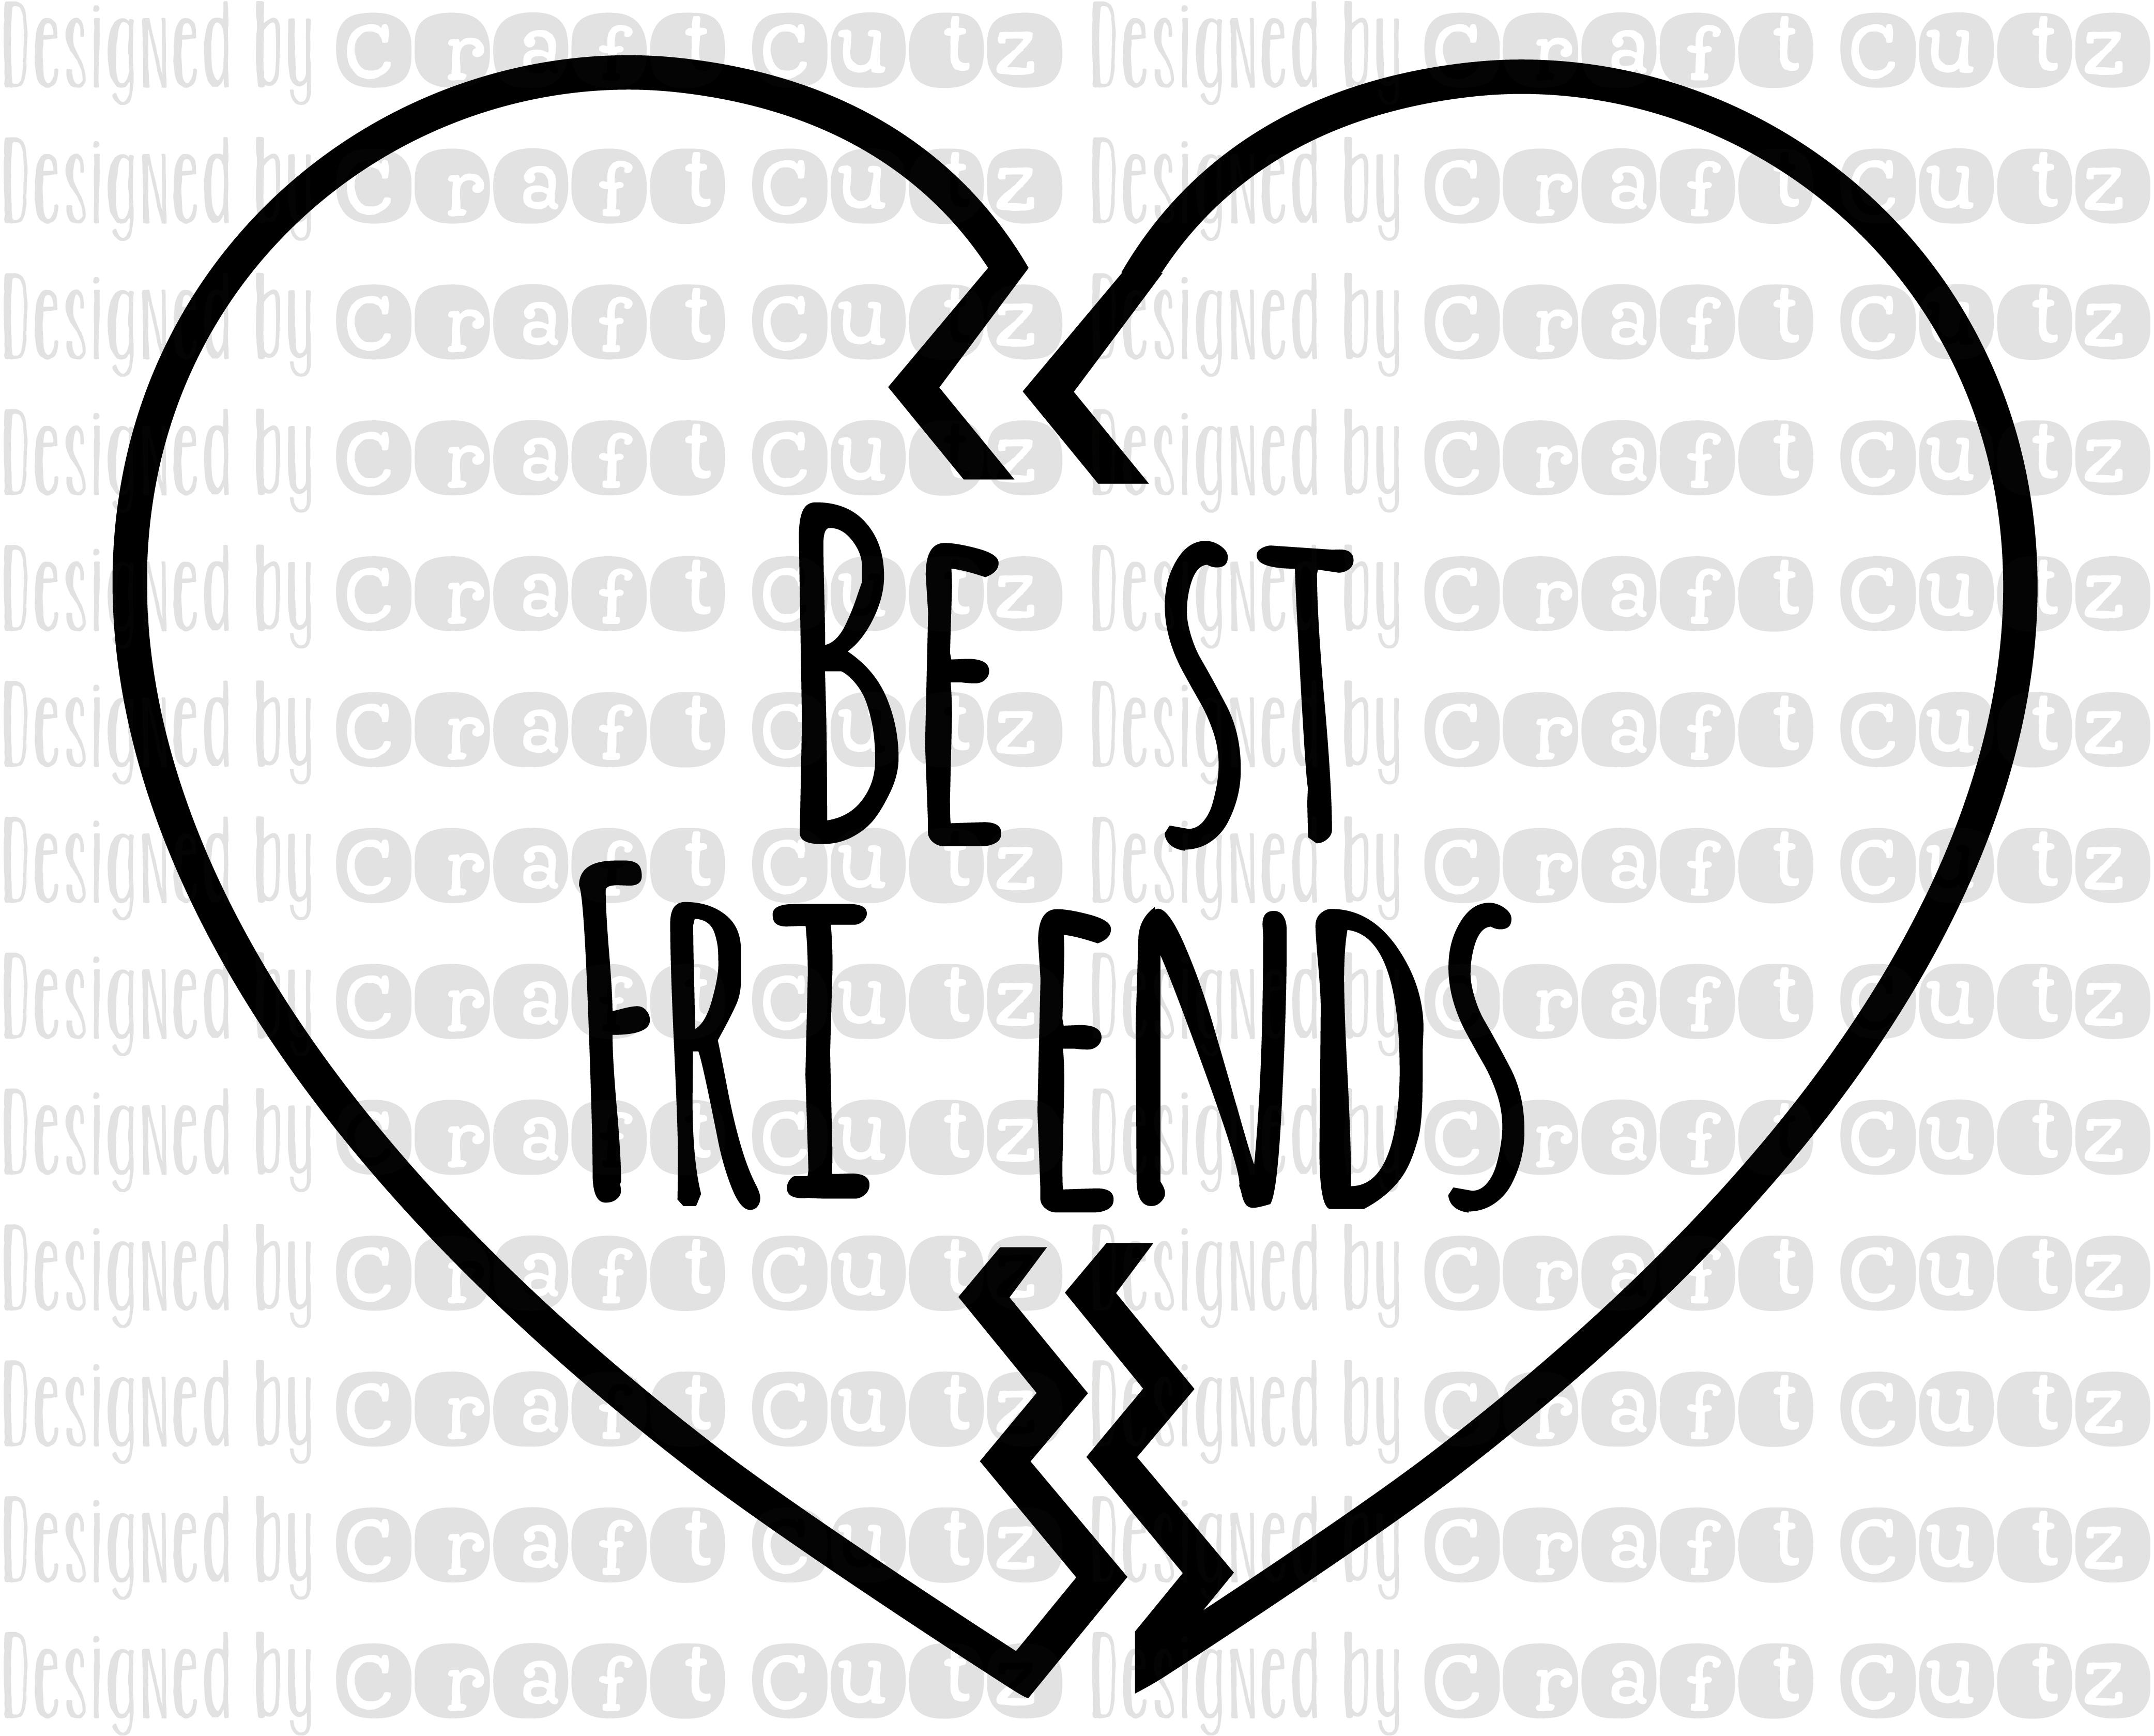 Best Friends Svg, Best Friends Dxf, Digital Download, Heart Svg, Best Friend - Two Friends PNG Black And White